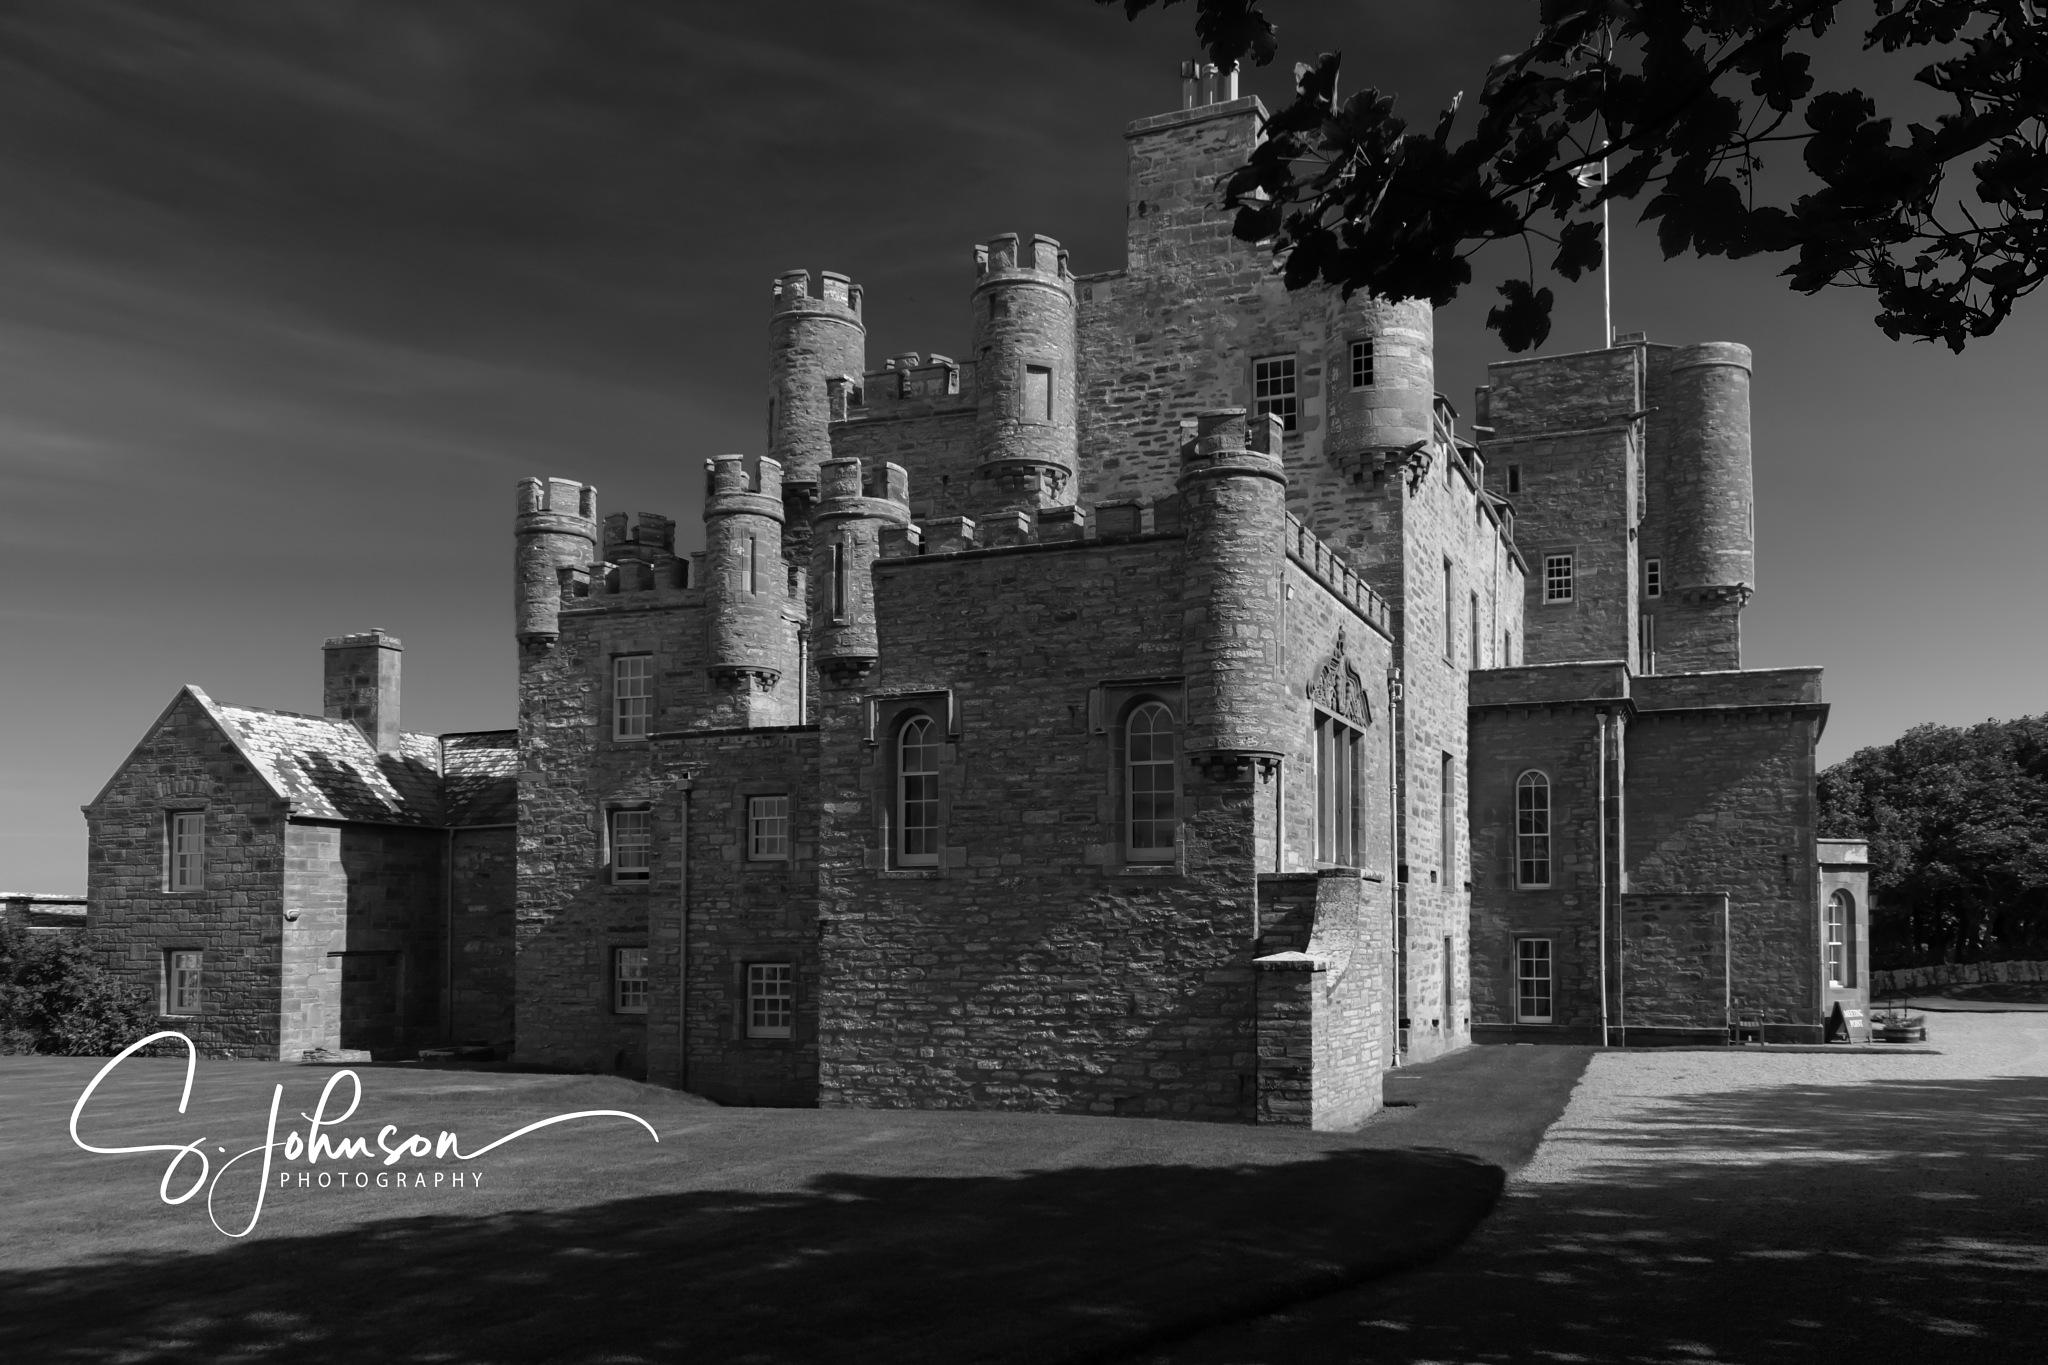 Castle of Mey by Sam Johnson